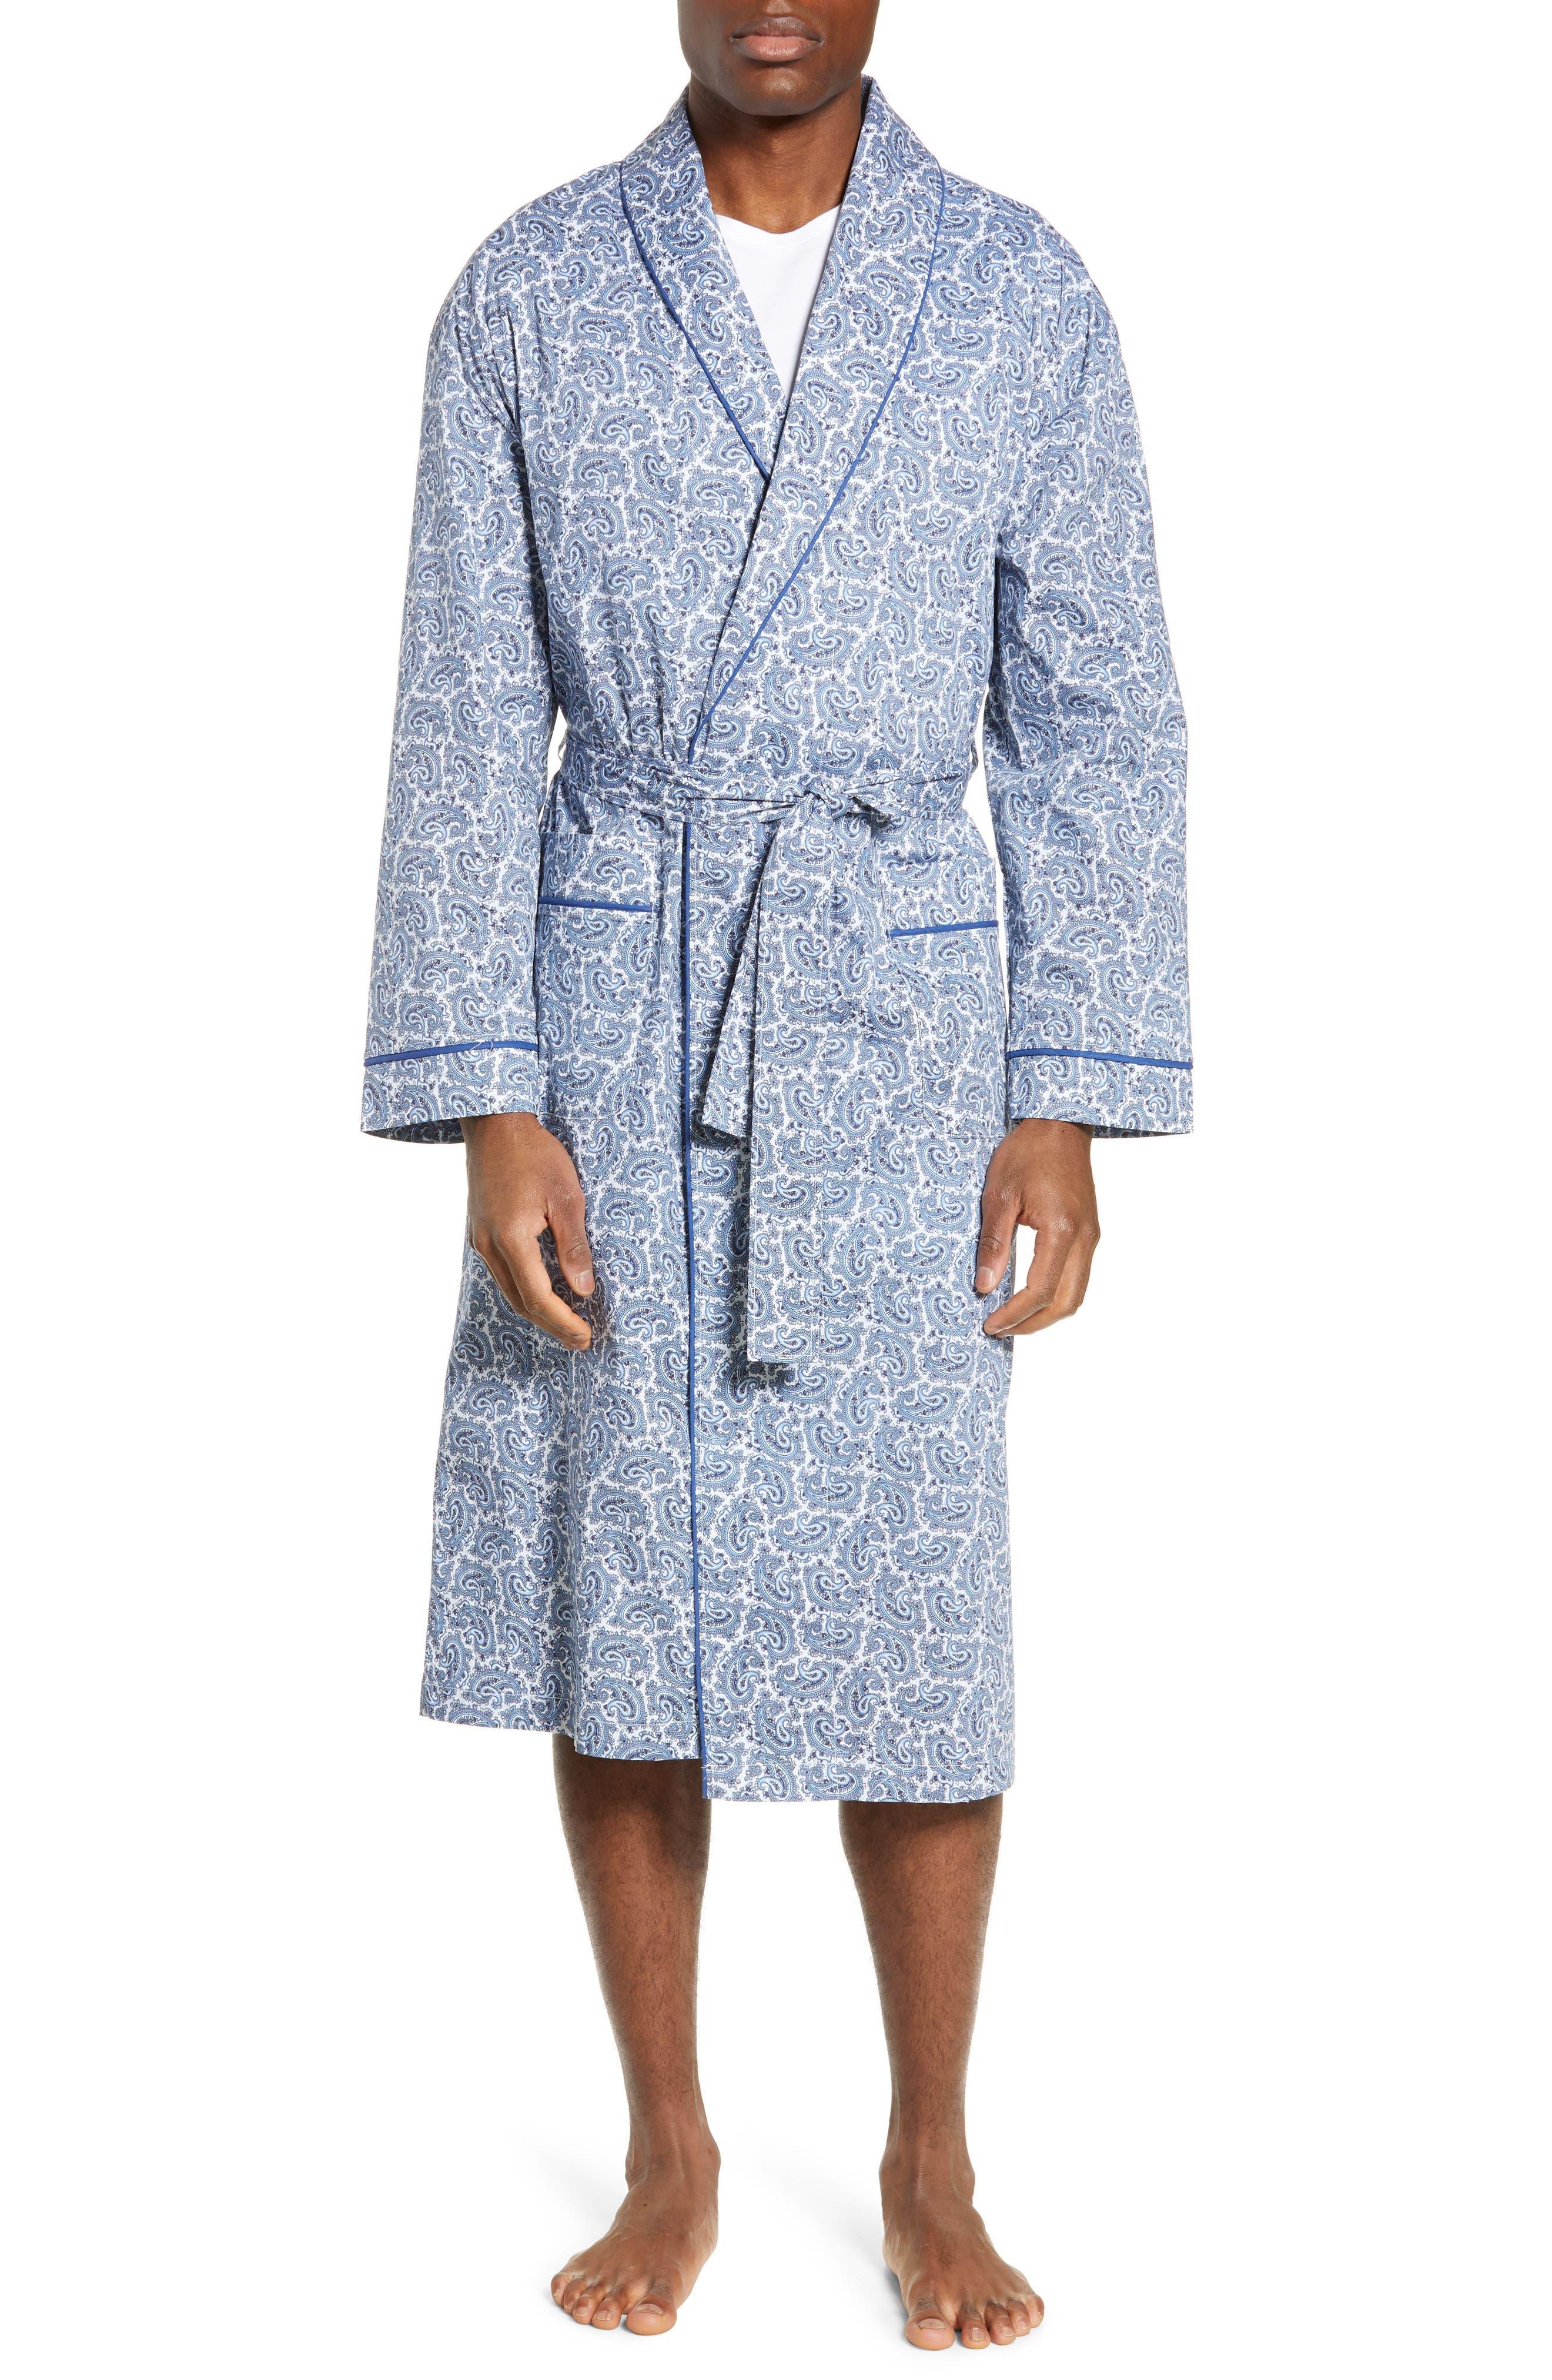 MAJESTIC INTERNATIONAL Marbella Stretch Sateen Robe, Main, color, POOL